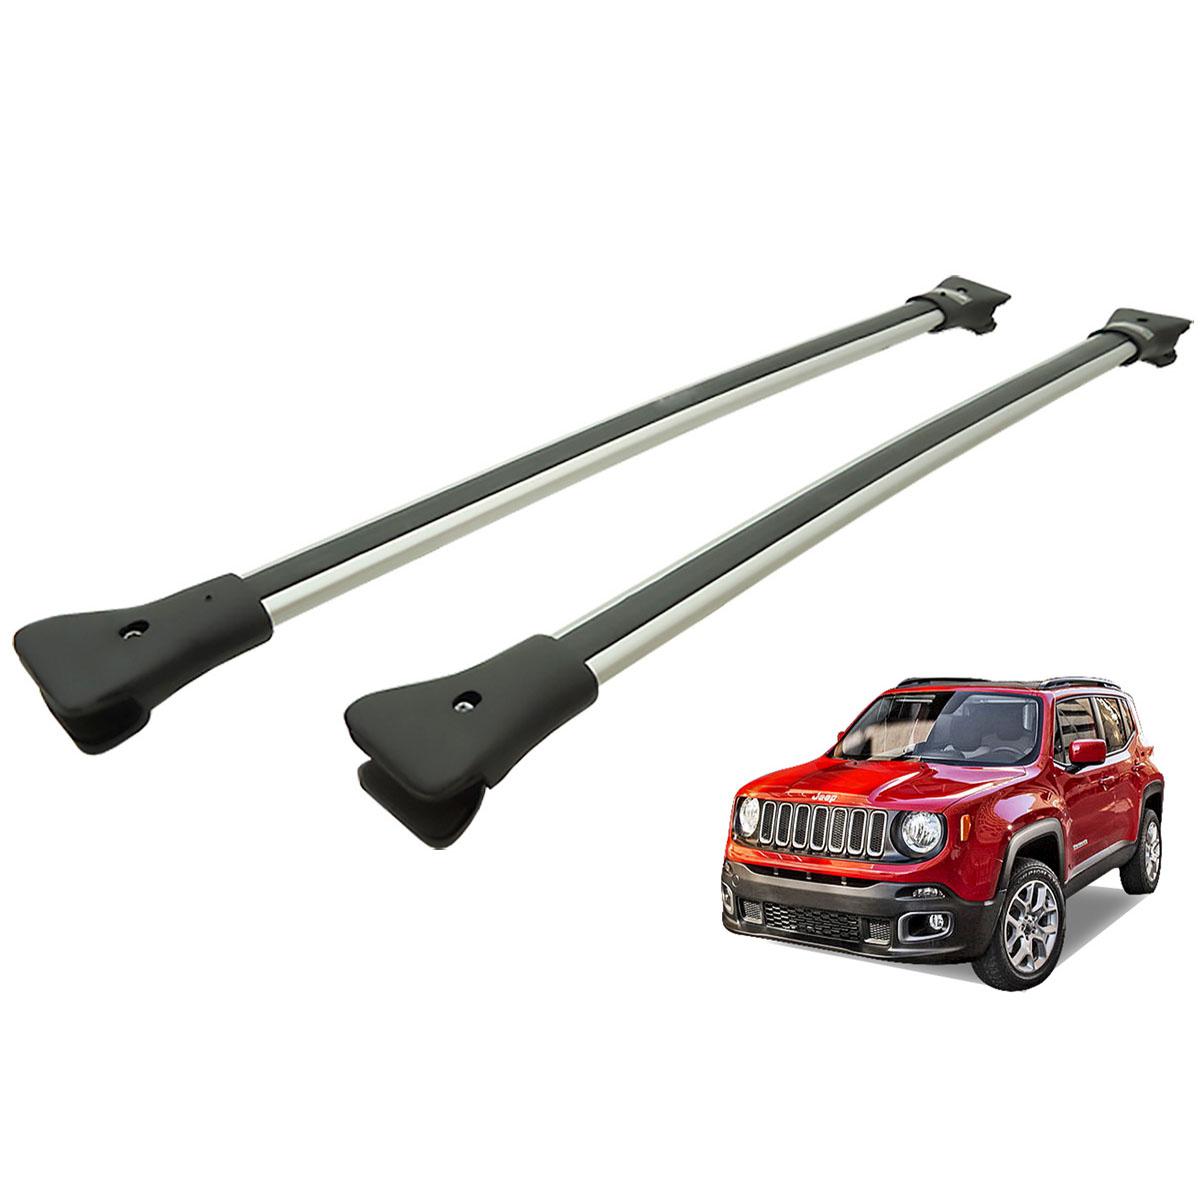 Travessa rack de teto larga alumínio Jeep Renegade 2016 2017